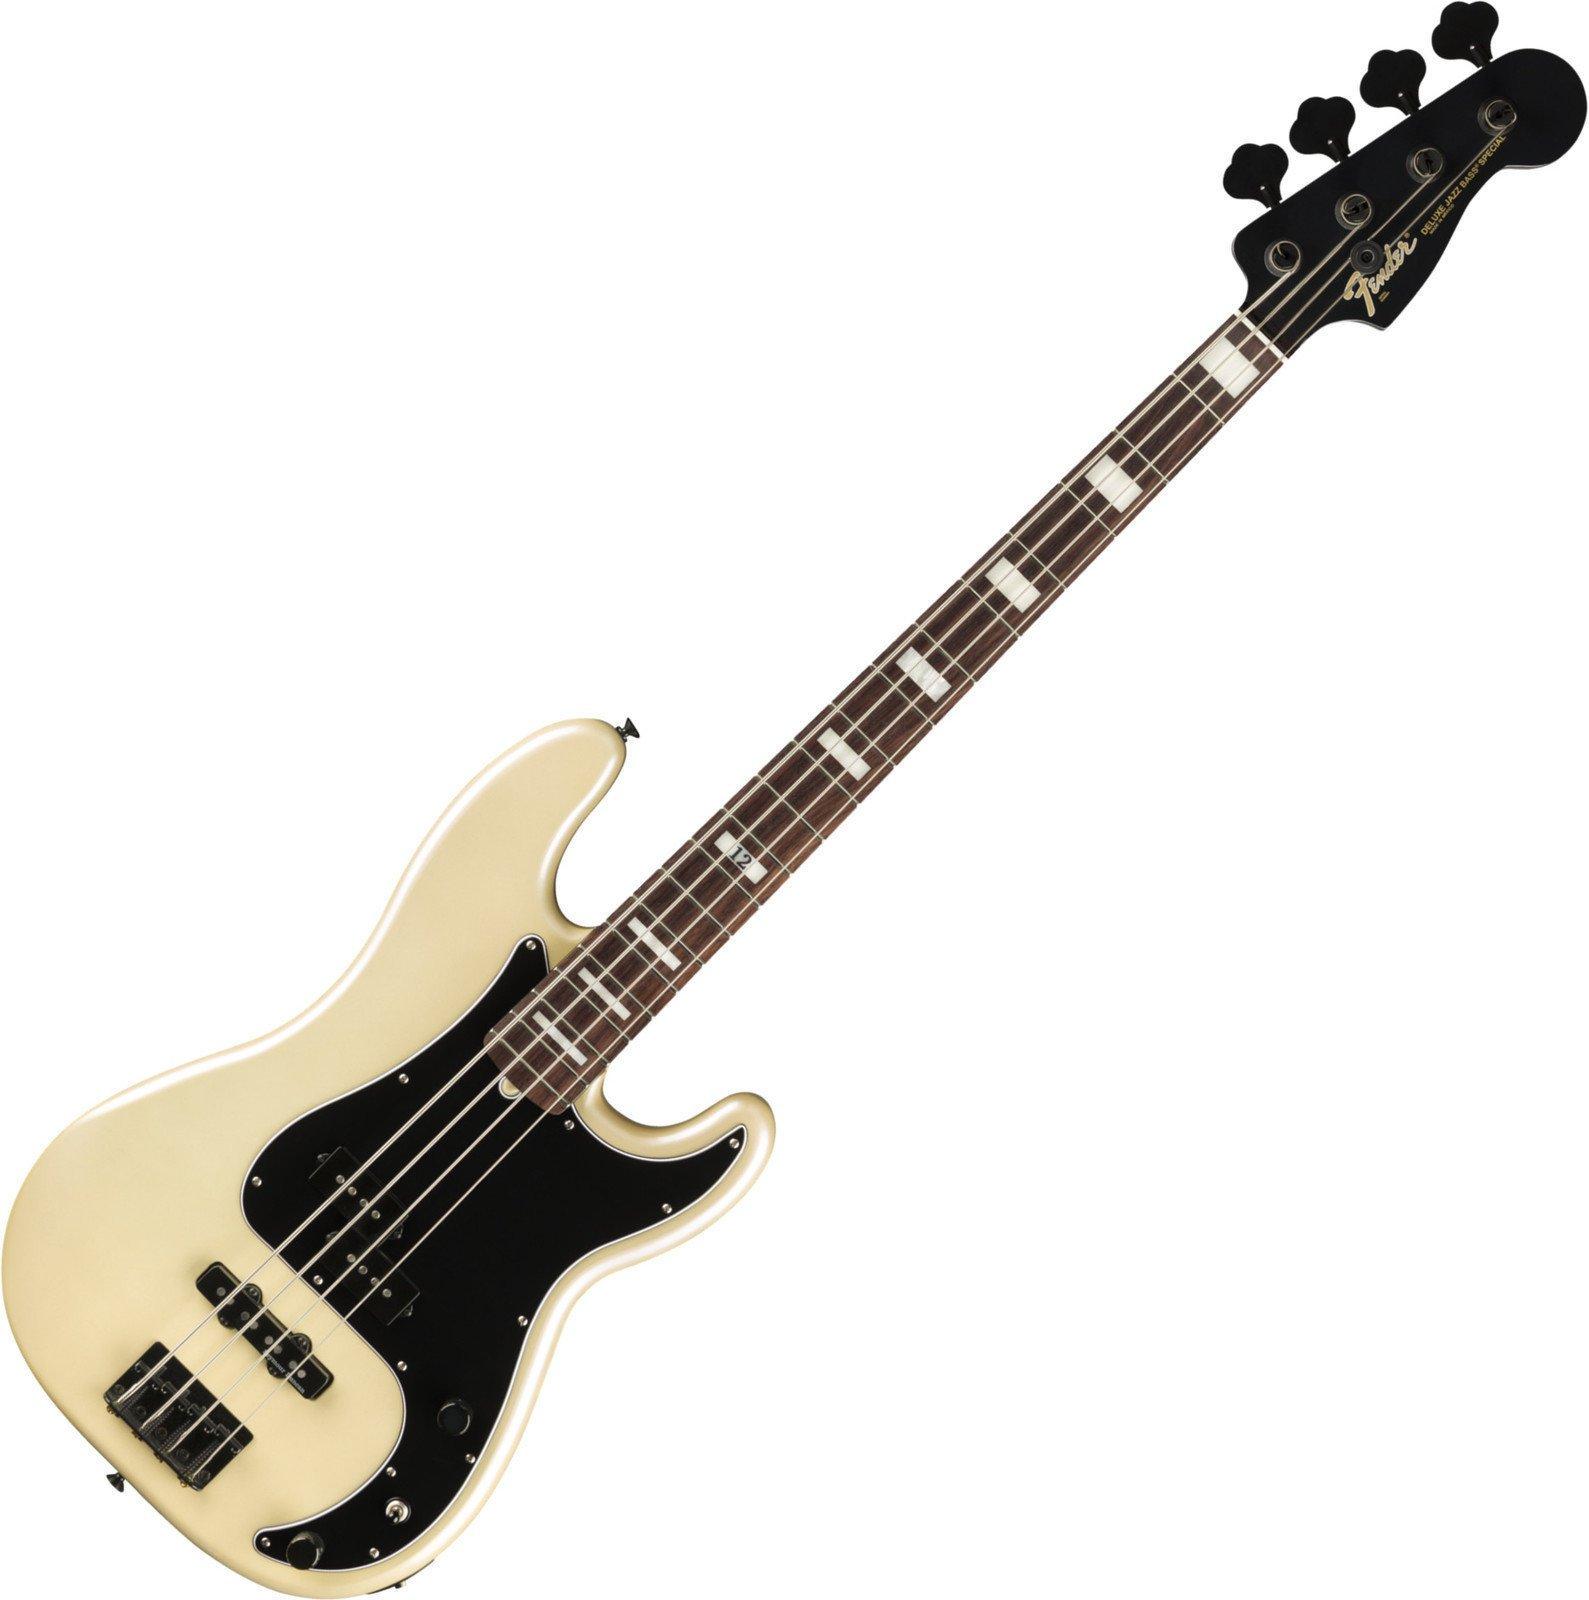 Fender Duff McKagan Deluxe Precision Bass RW White Pearl Fender